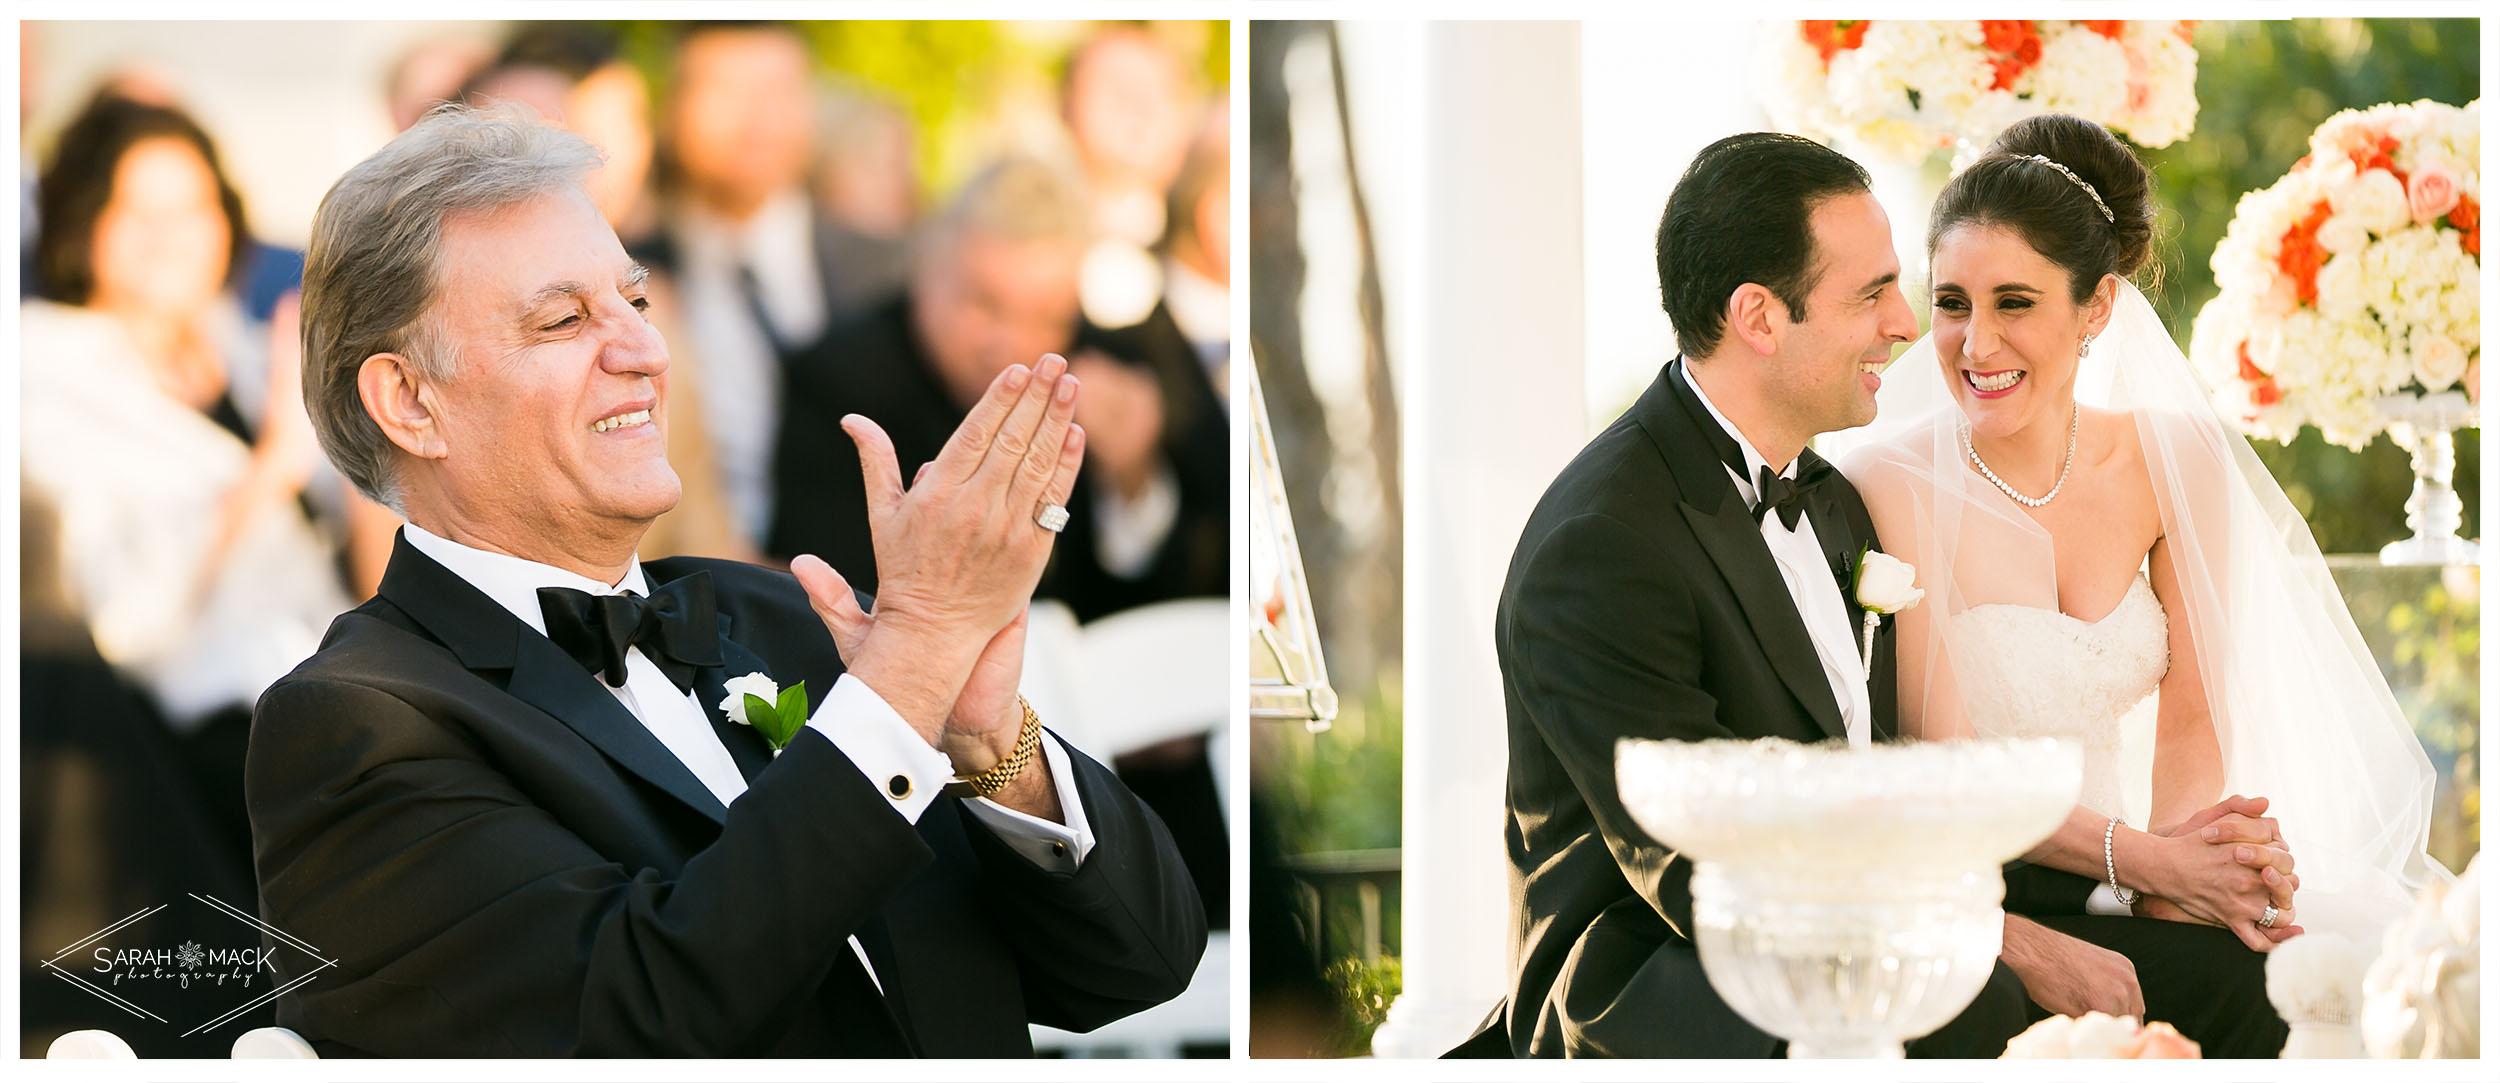 NJ-Newport-Beach-Marriott-Wedding-28.jpg